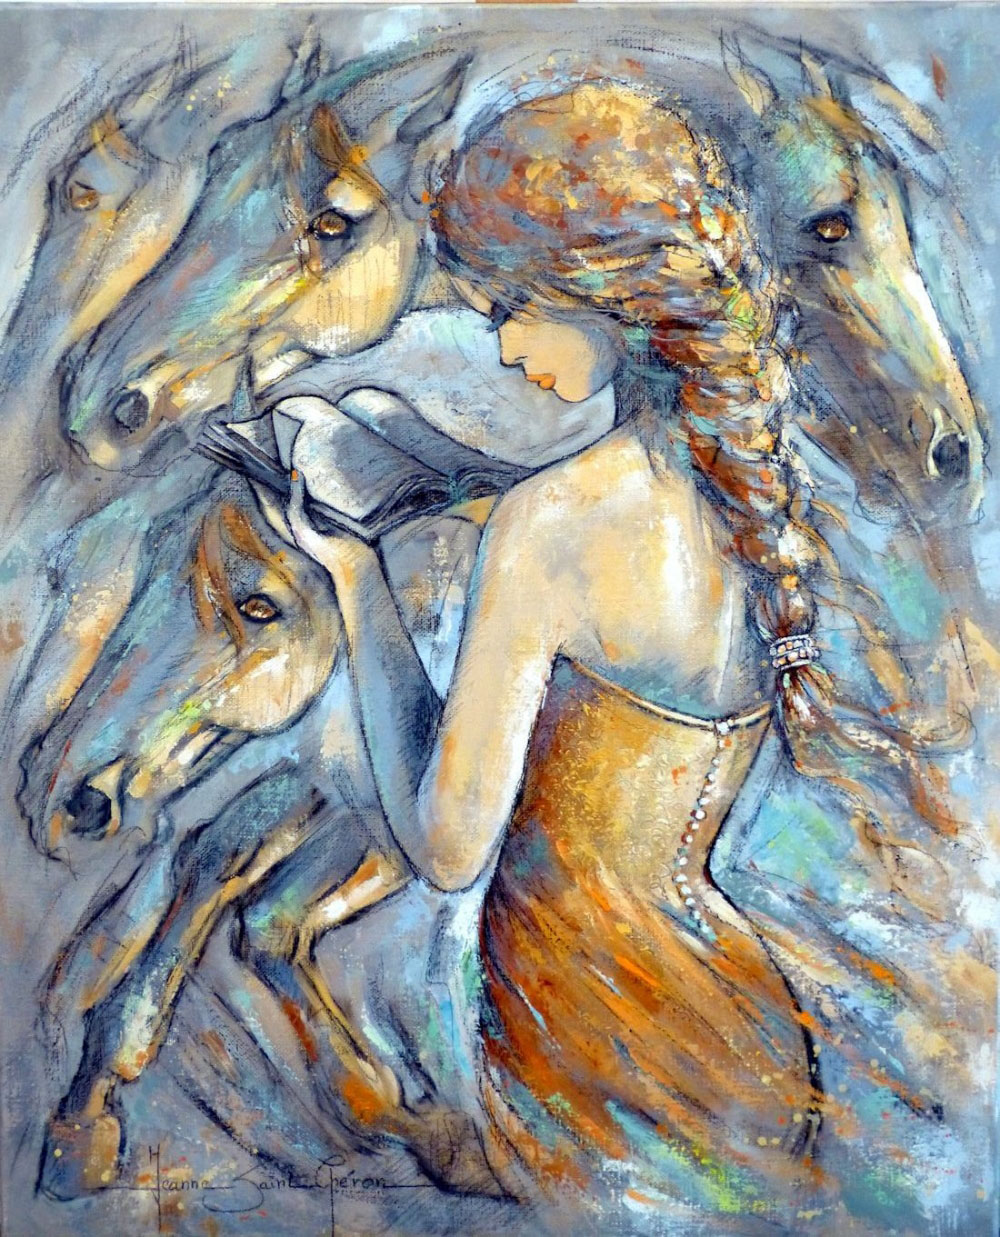 painting artwork woman by jeanne saint cheron